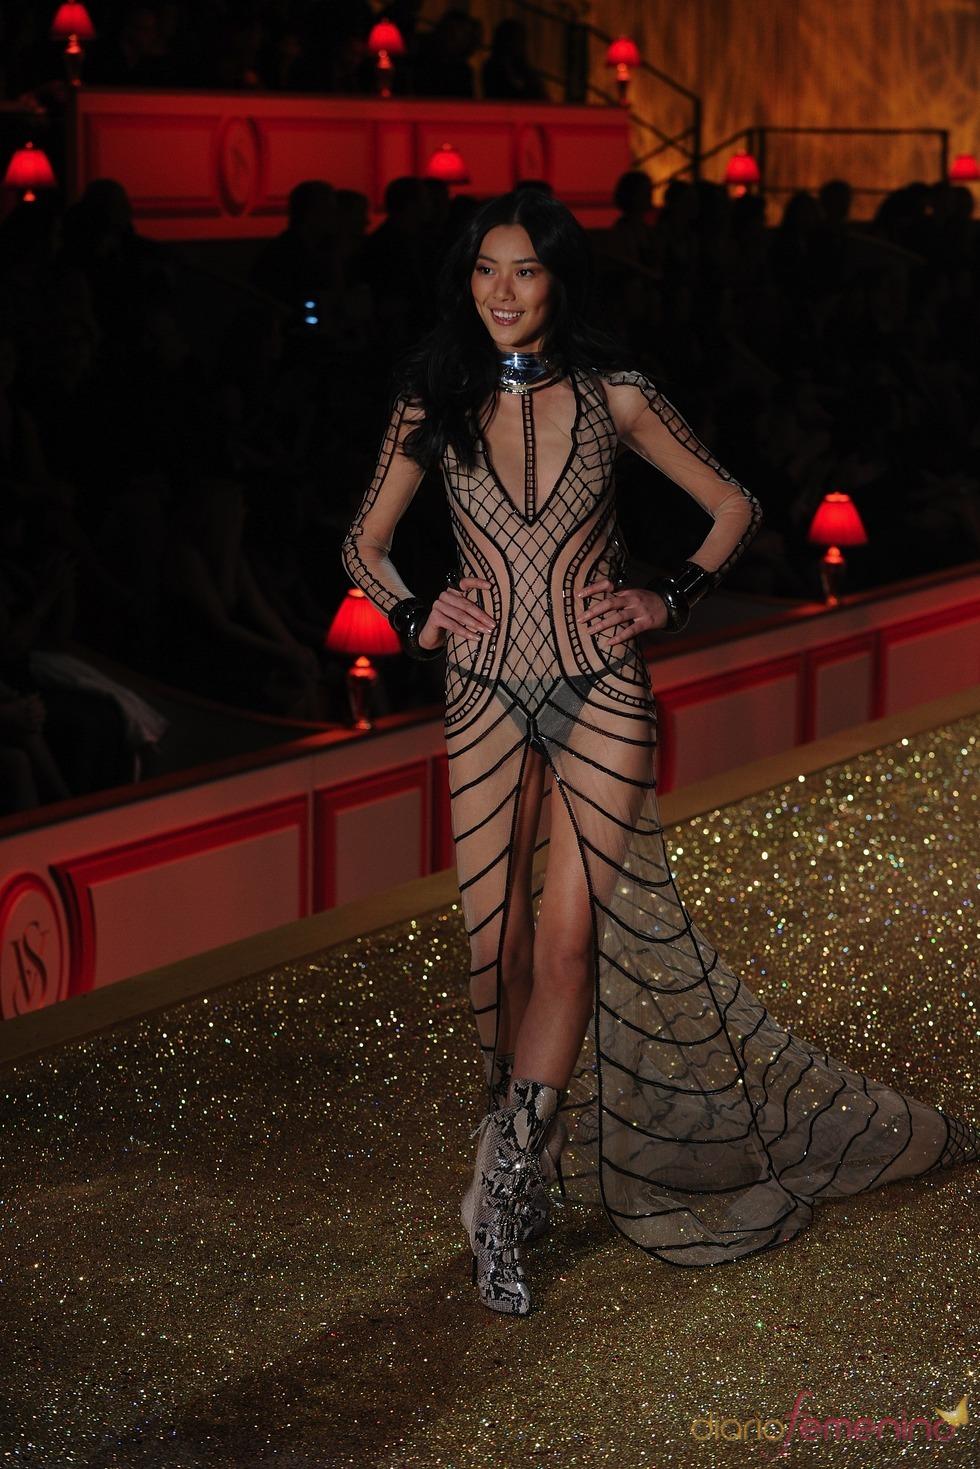 Espectacular escaparate de modelos de Victoria's Secret